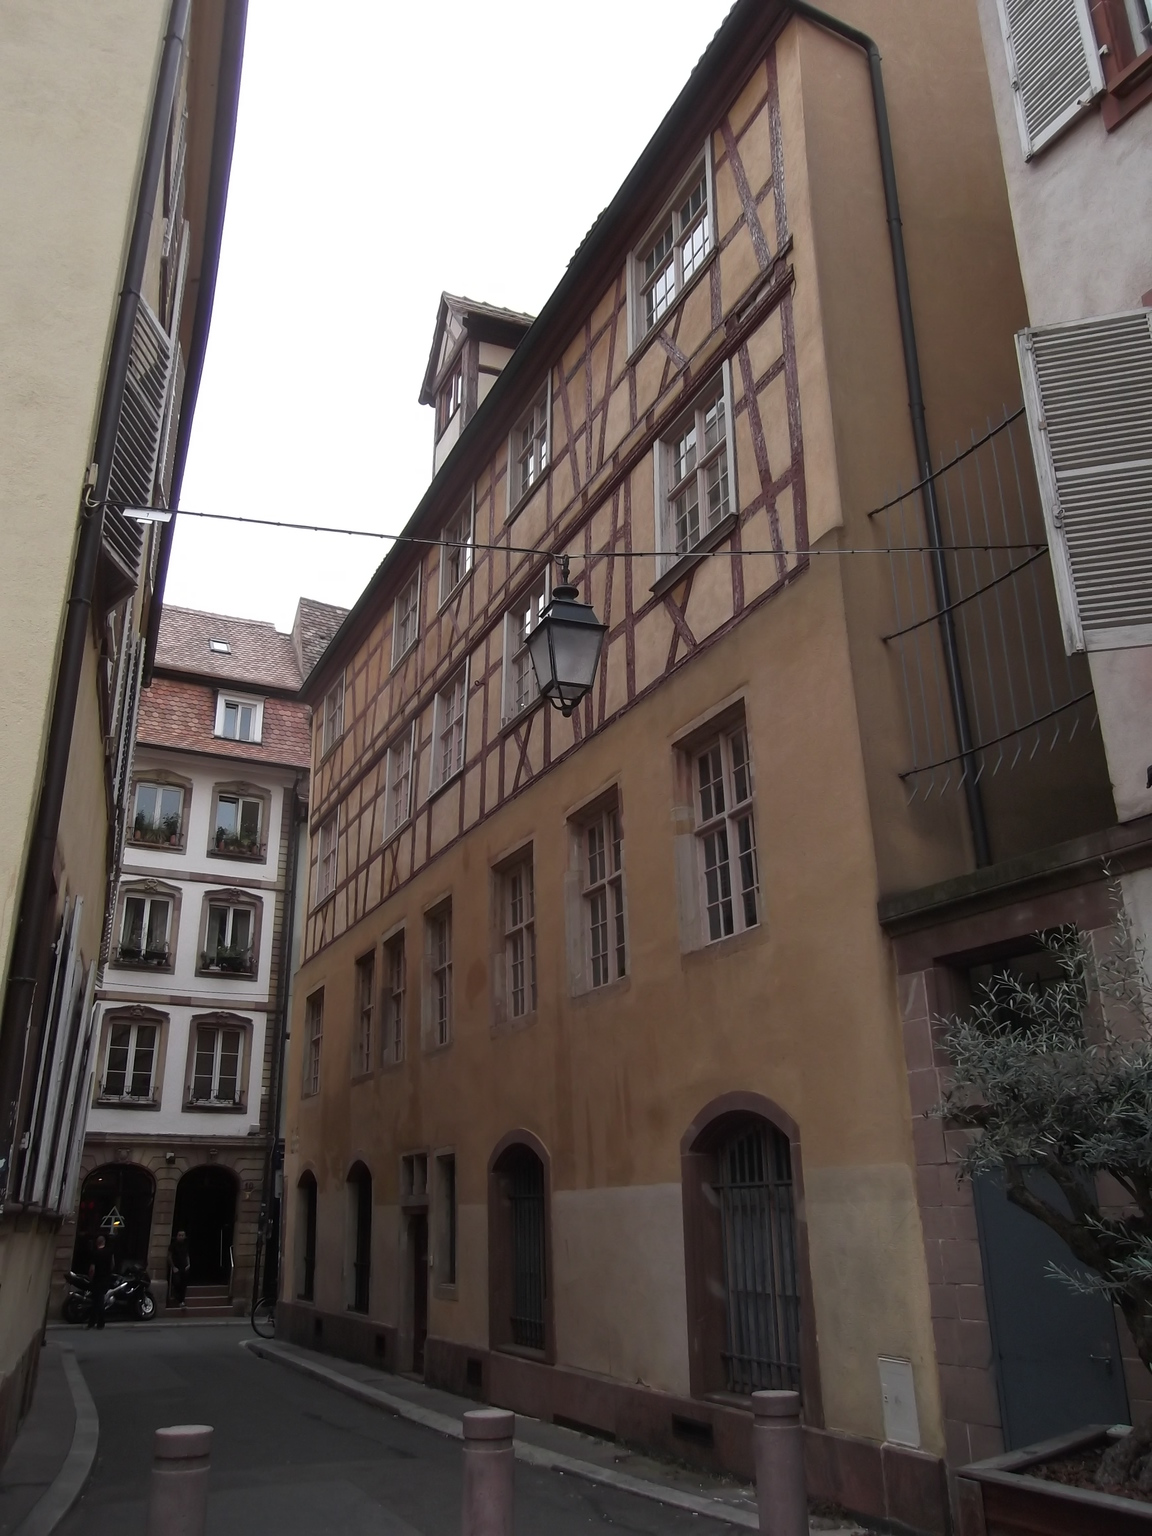 Maisons de strasbourg 5 rue de l epine for Rue du miroir strasbourg